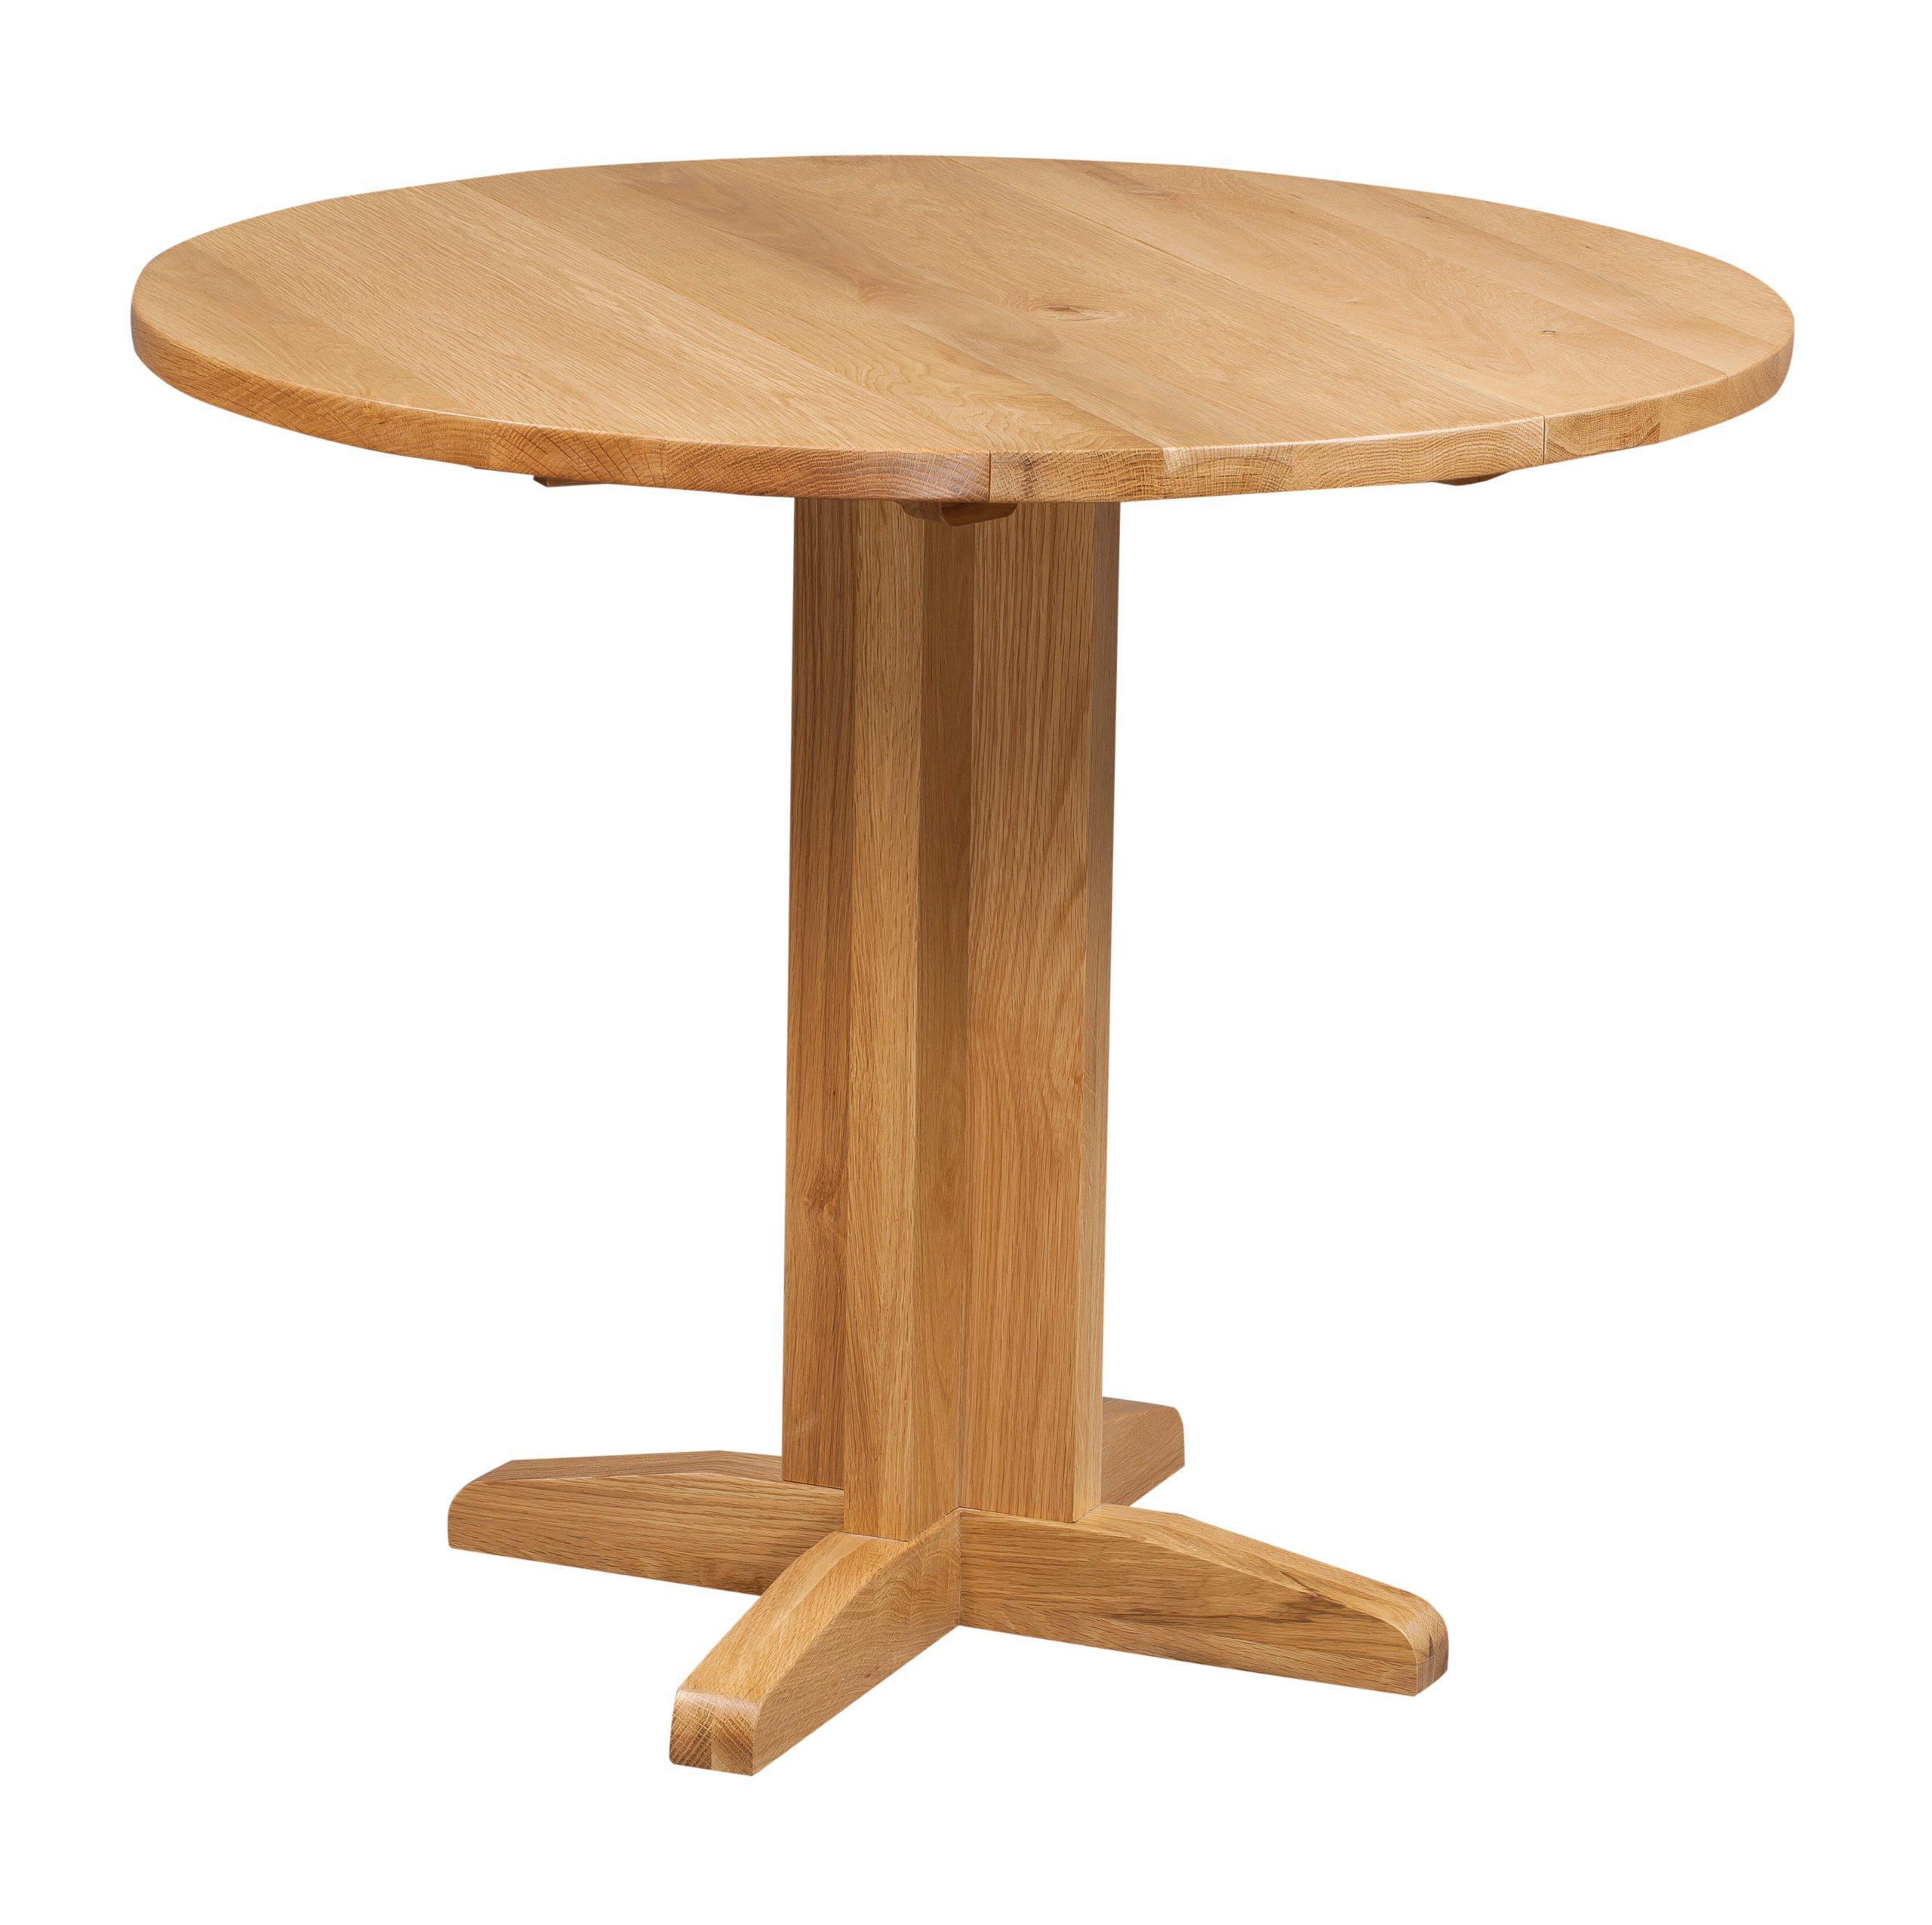 Dorset Drop Leaf Table 30cm to 90cm in light oak finish